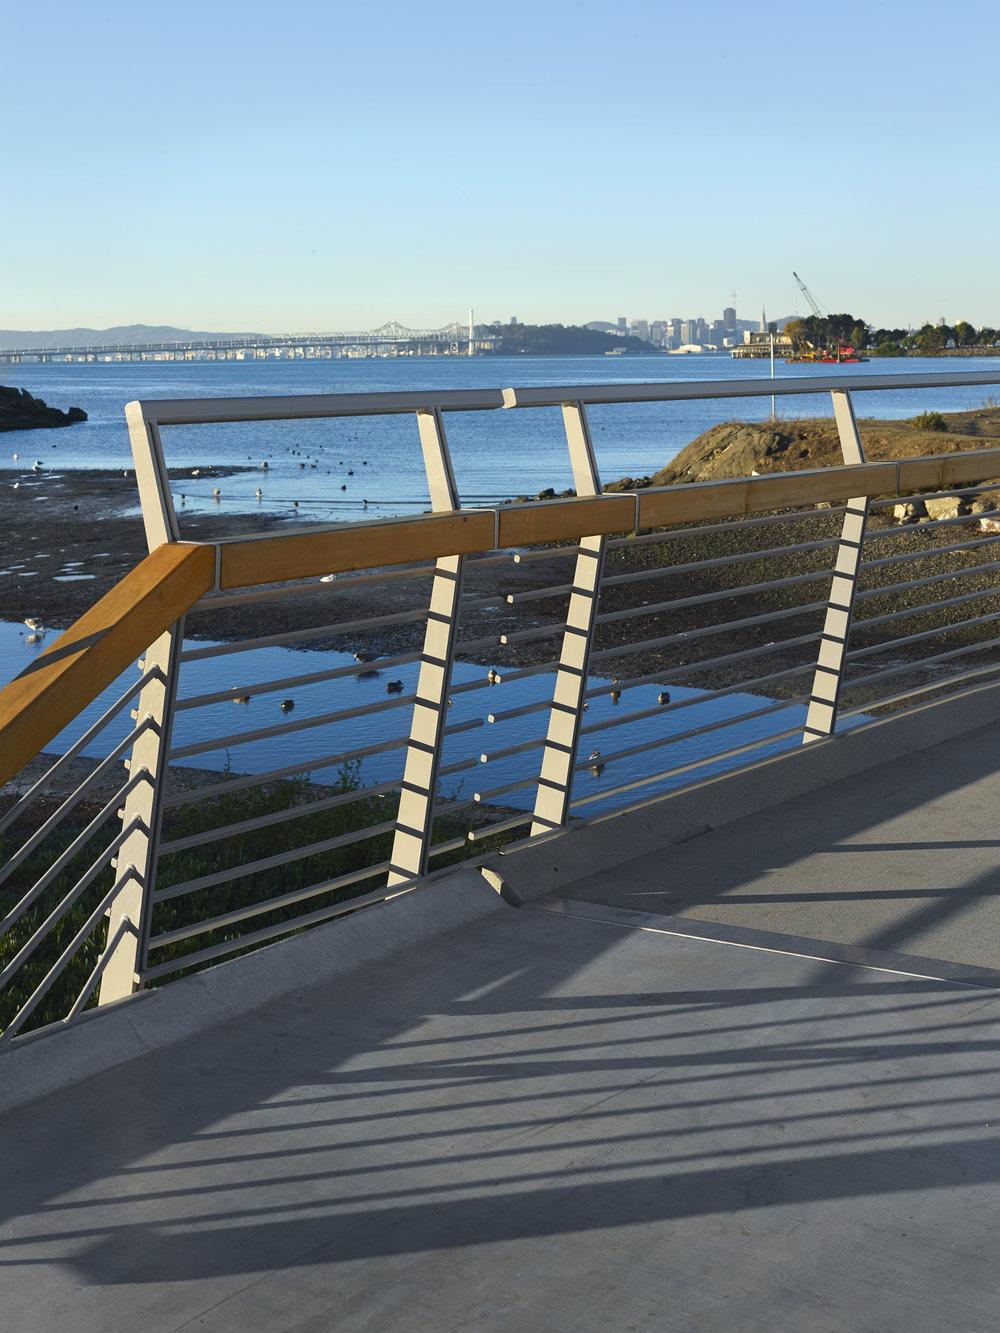 Client: City of Berkeley Landscape Architect (Prime): 2M Associates Architect: Endres Ware Civil & Structural Engineer: Endres Ware Geotechnical: Kleinfelder, Inc. Photographer: Cesar Rubio